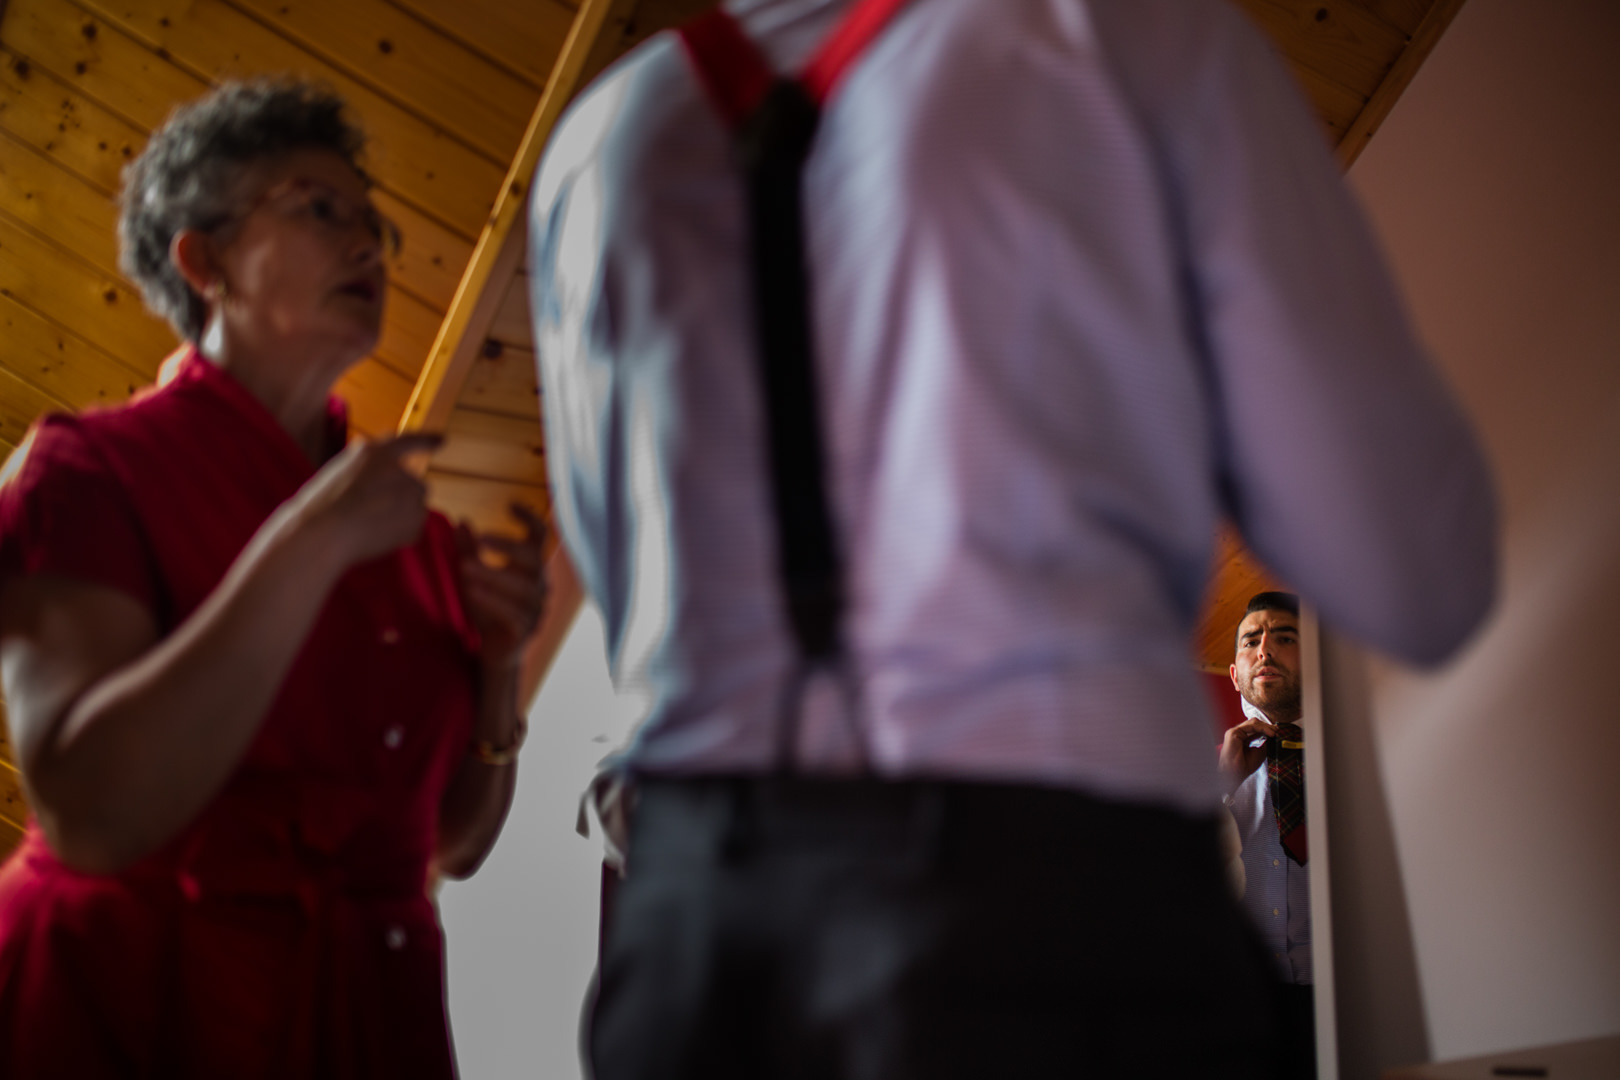 Boda-Lucia-Javi-Lugo-Rafael-Torres-fotografo-bodas-sevilla-madrid-barcelona-wedding-photographer--3.jpg